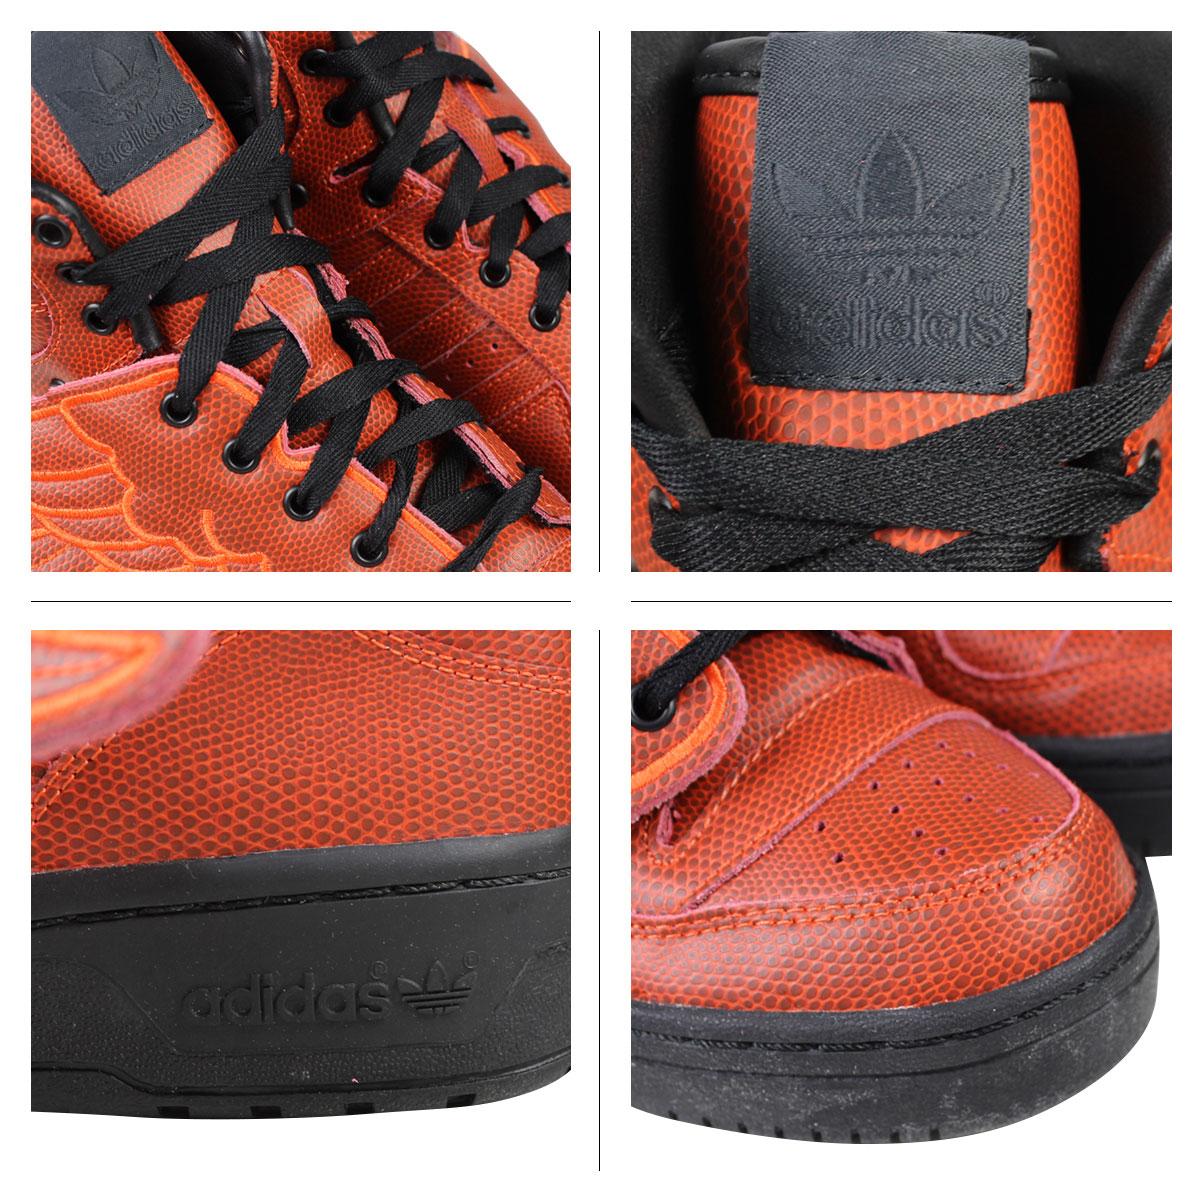 e1e3ad4cfa4a Adidas originals adidas Originals JEREMY SCOTT men s women s BBALL JS WINGS  sneakers Jeremy Scott wings basketball S77803 Red  11   10 new in stock